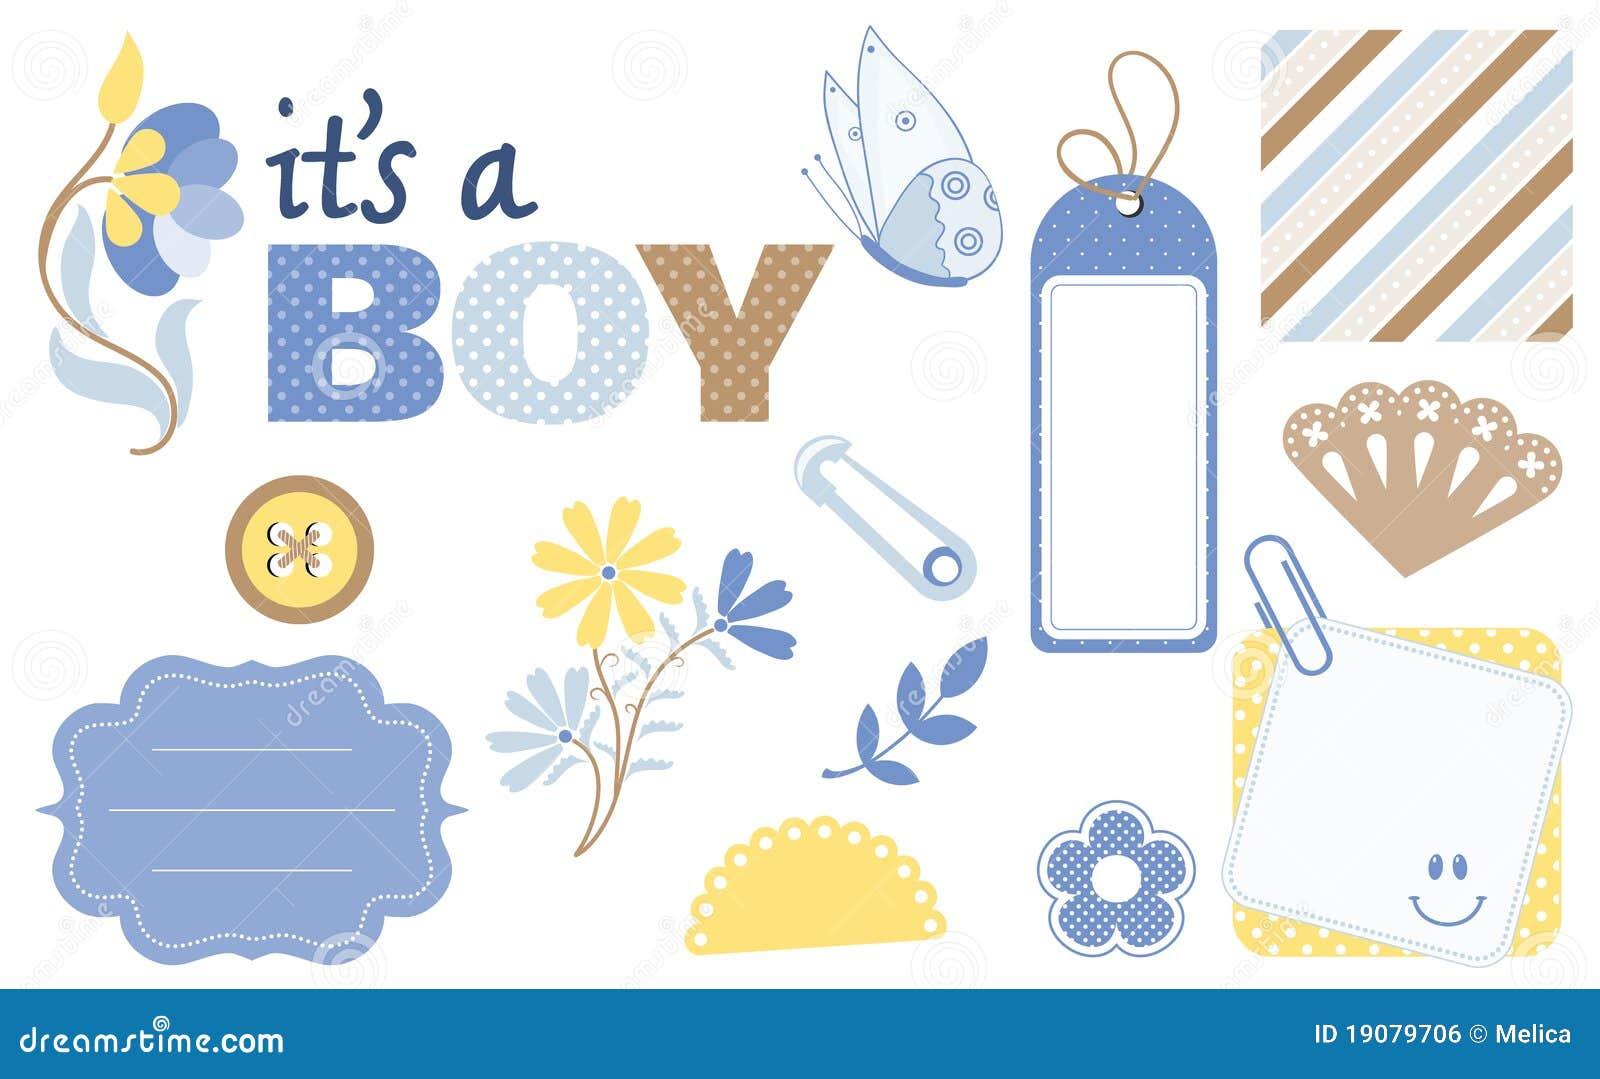 Baby Scrapbook Design Elements Stock Vector Illustration Of